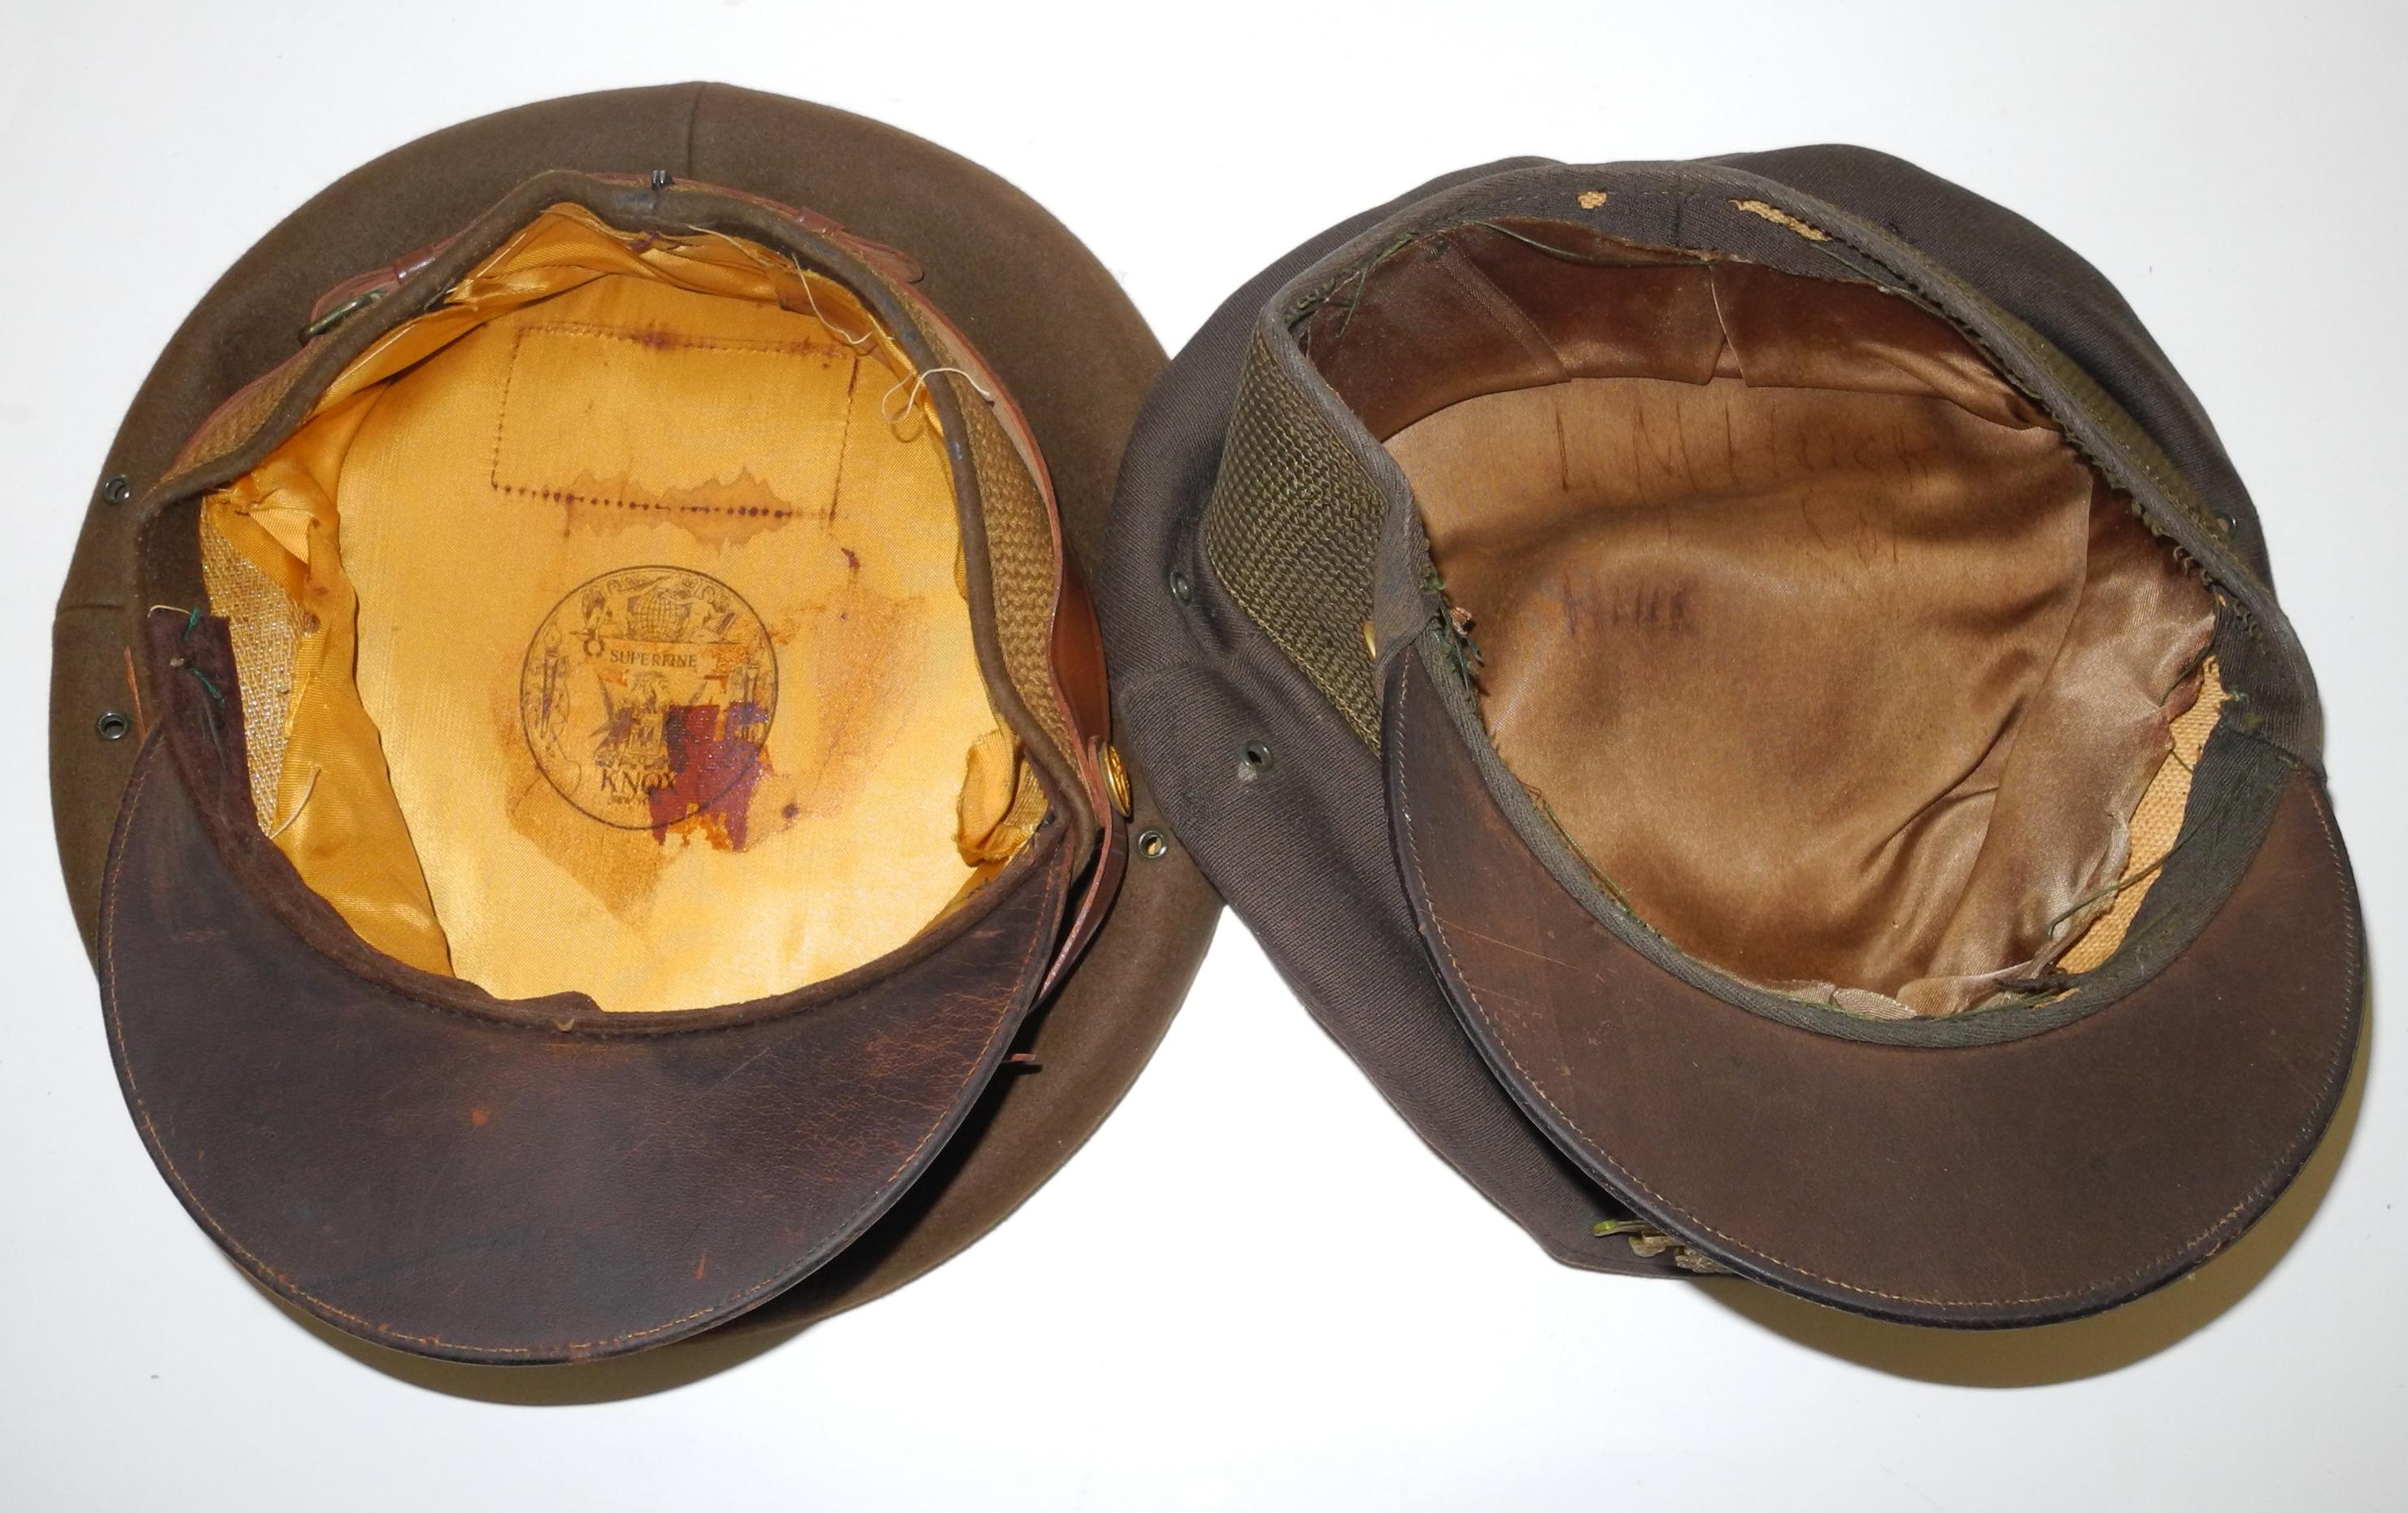 2 x US Army / AAF officer's visor caps